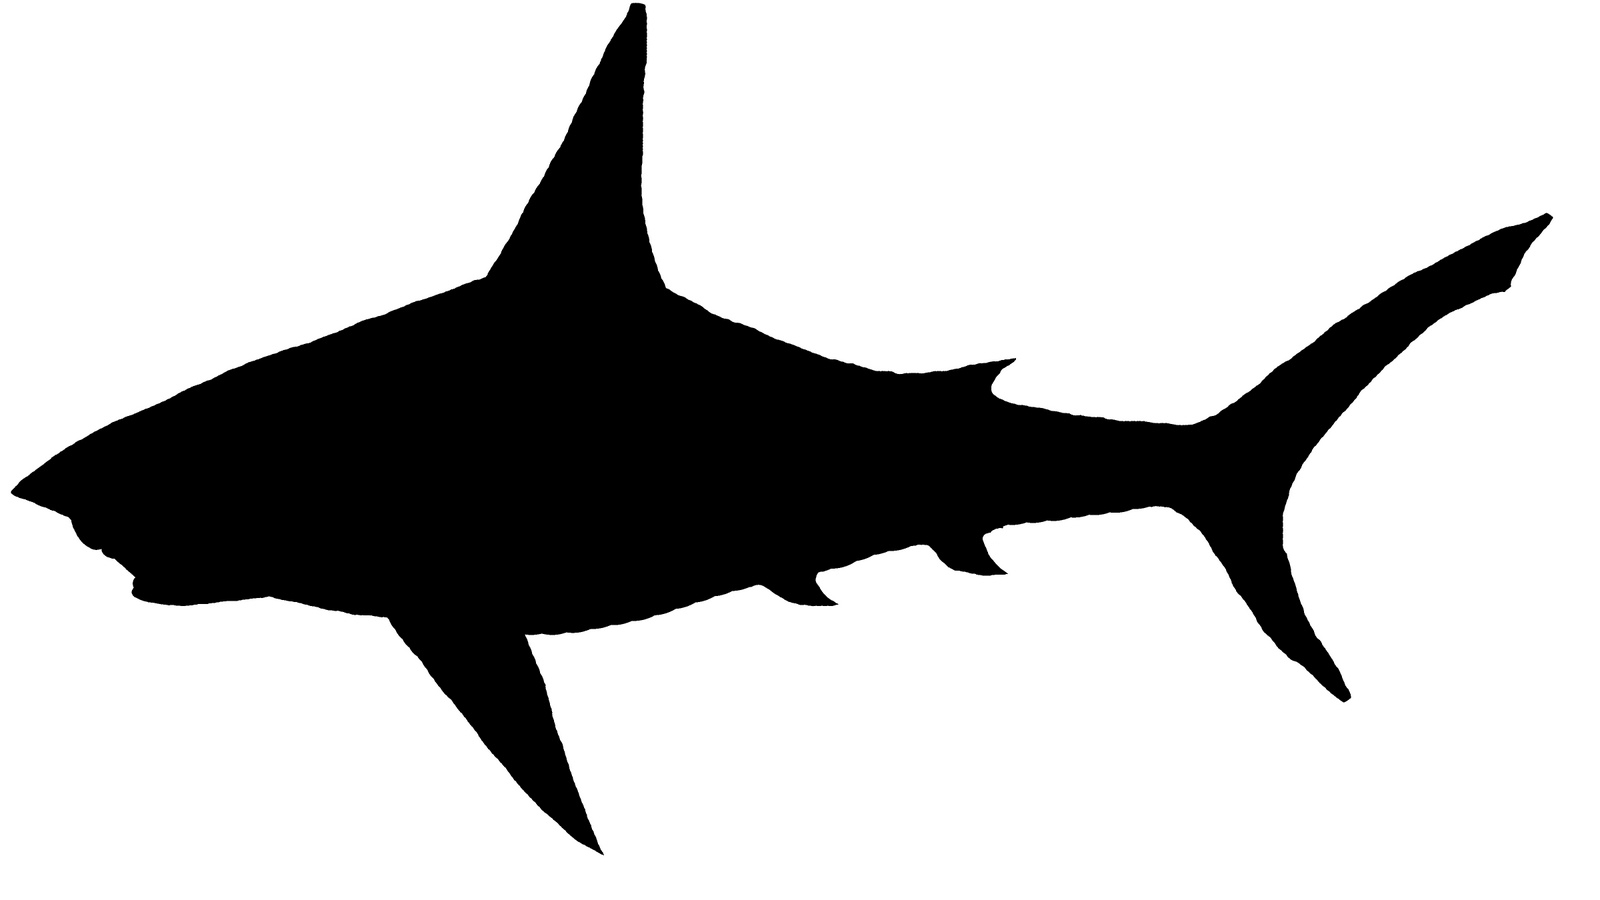 shark silouette shark silhouette amazoncom silouette shark